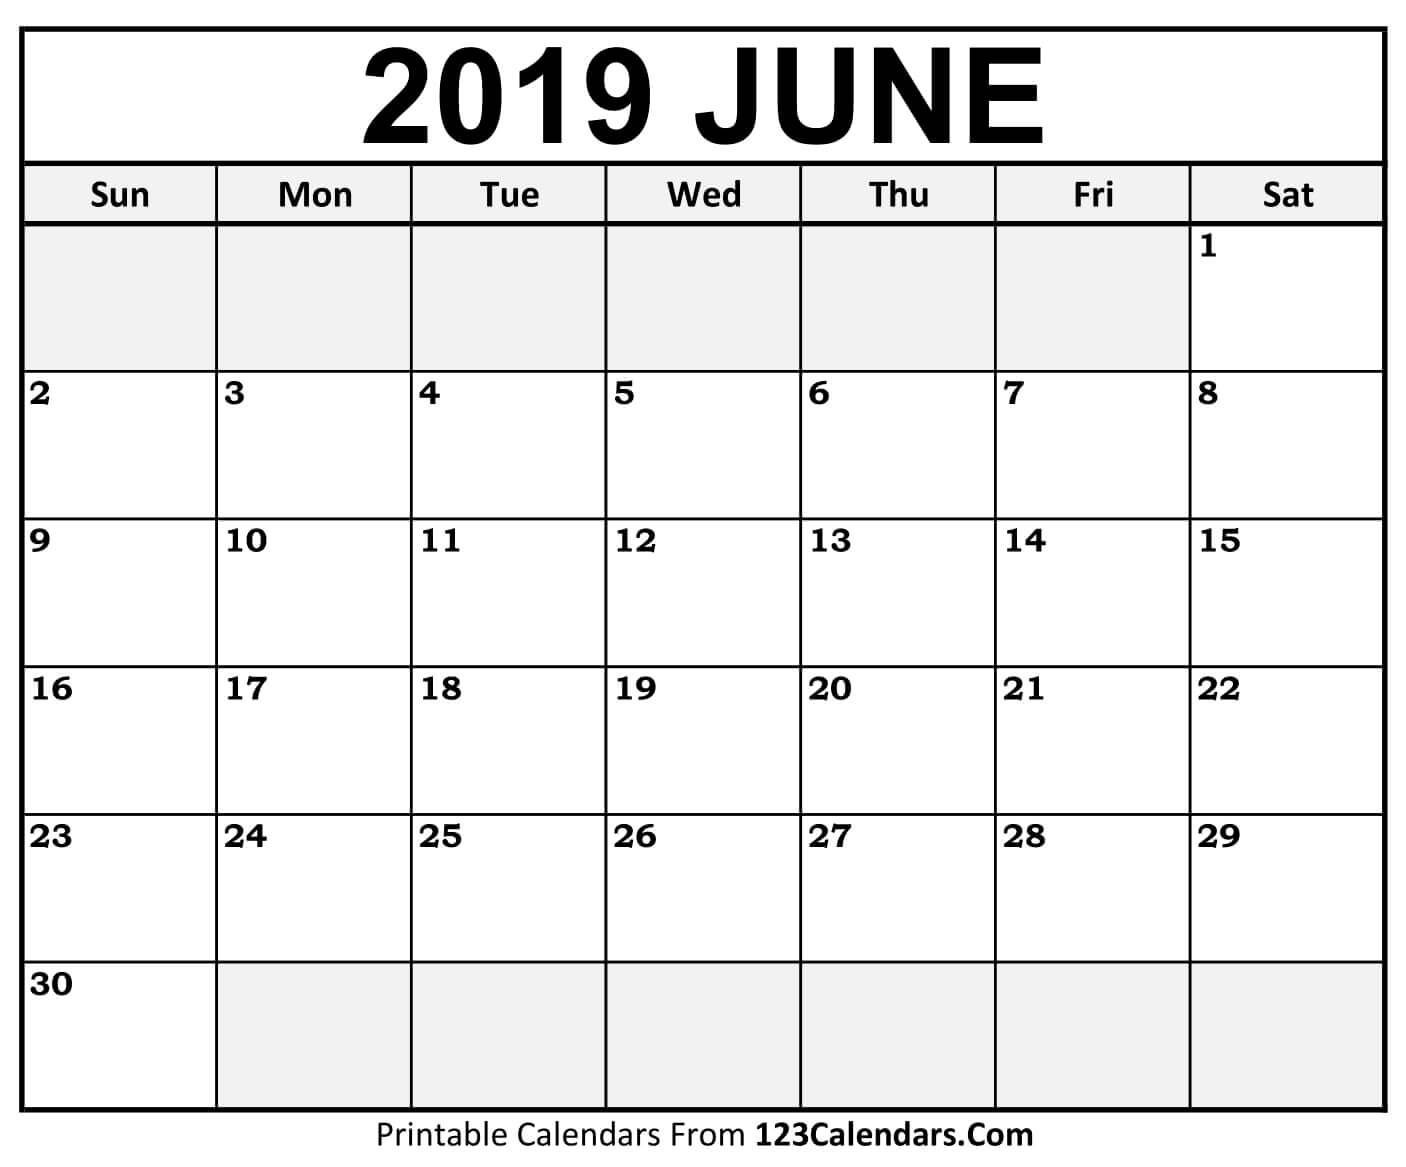 Printable June 2019 Calendar Templates – 123Calendars Calendar 2019 June